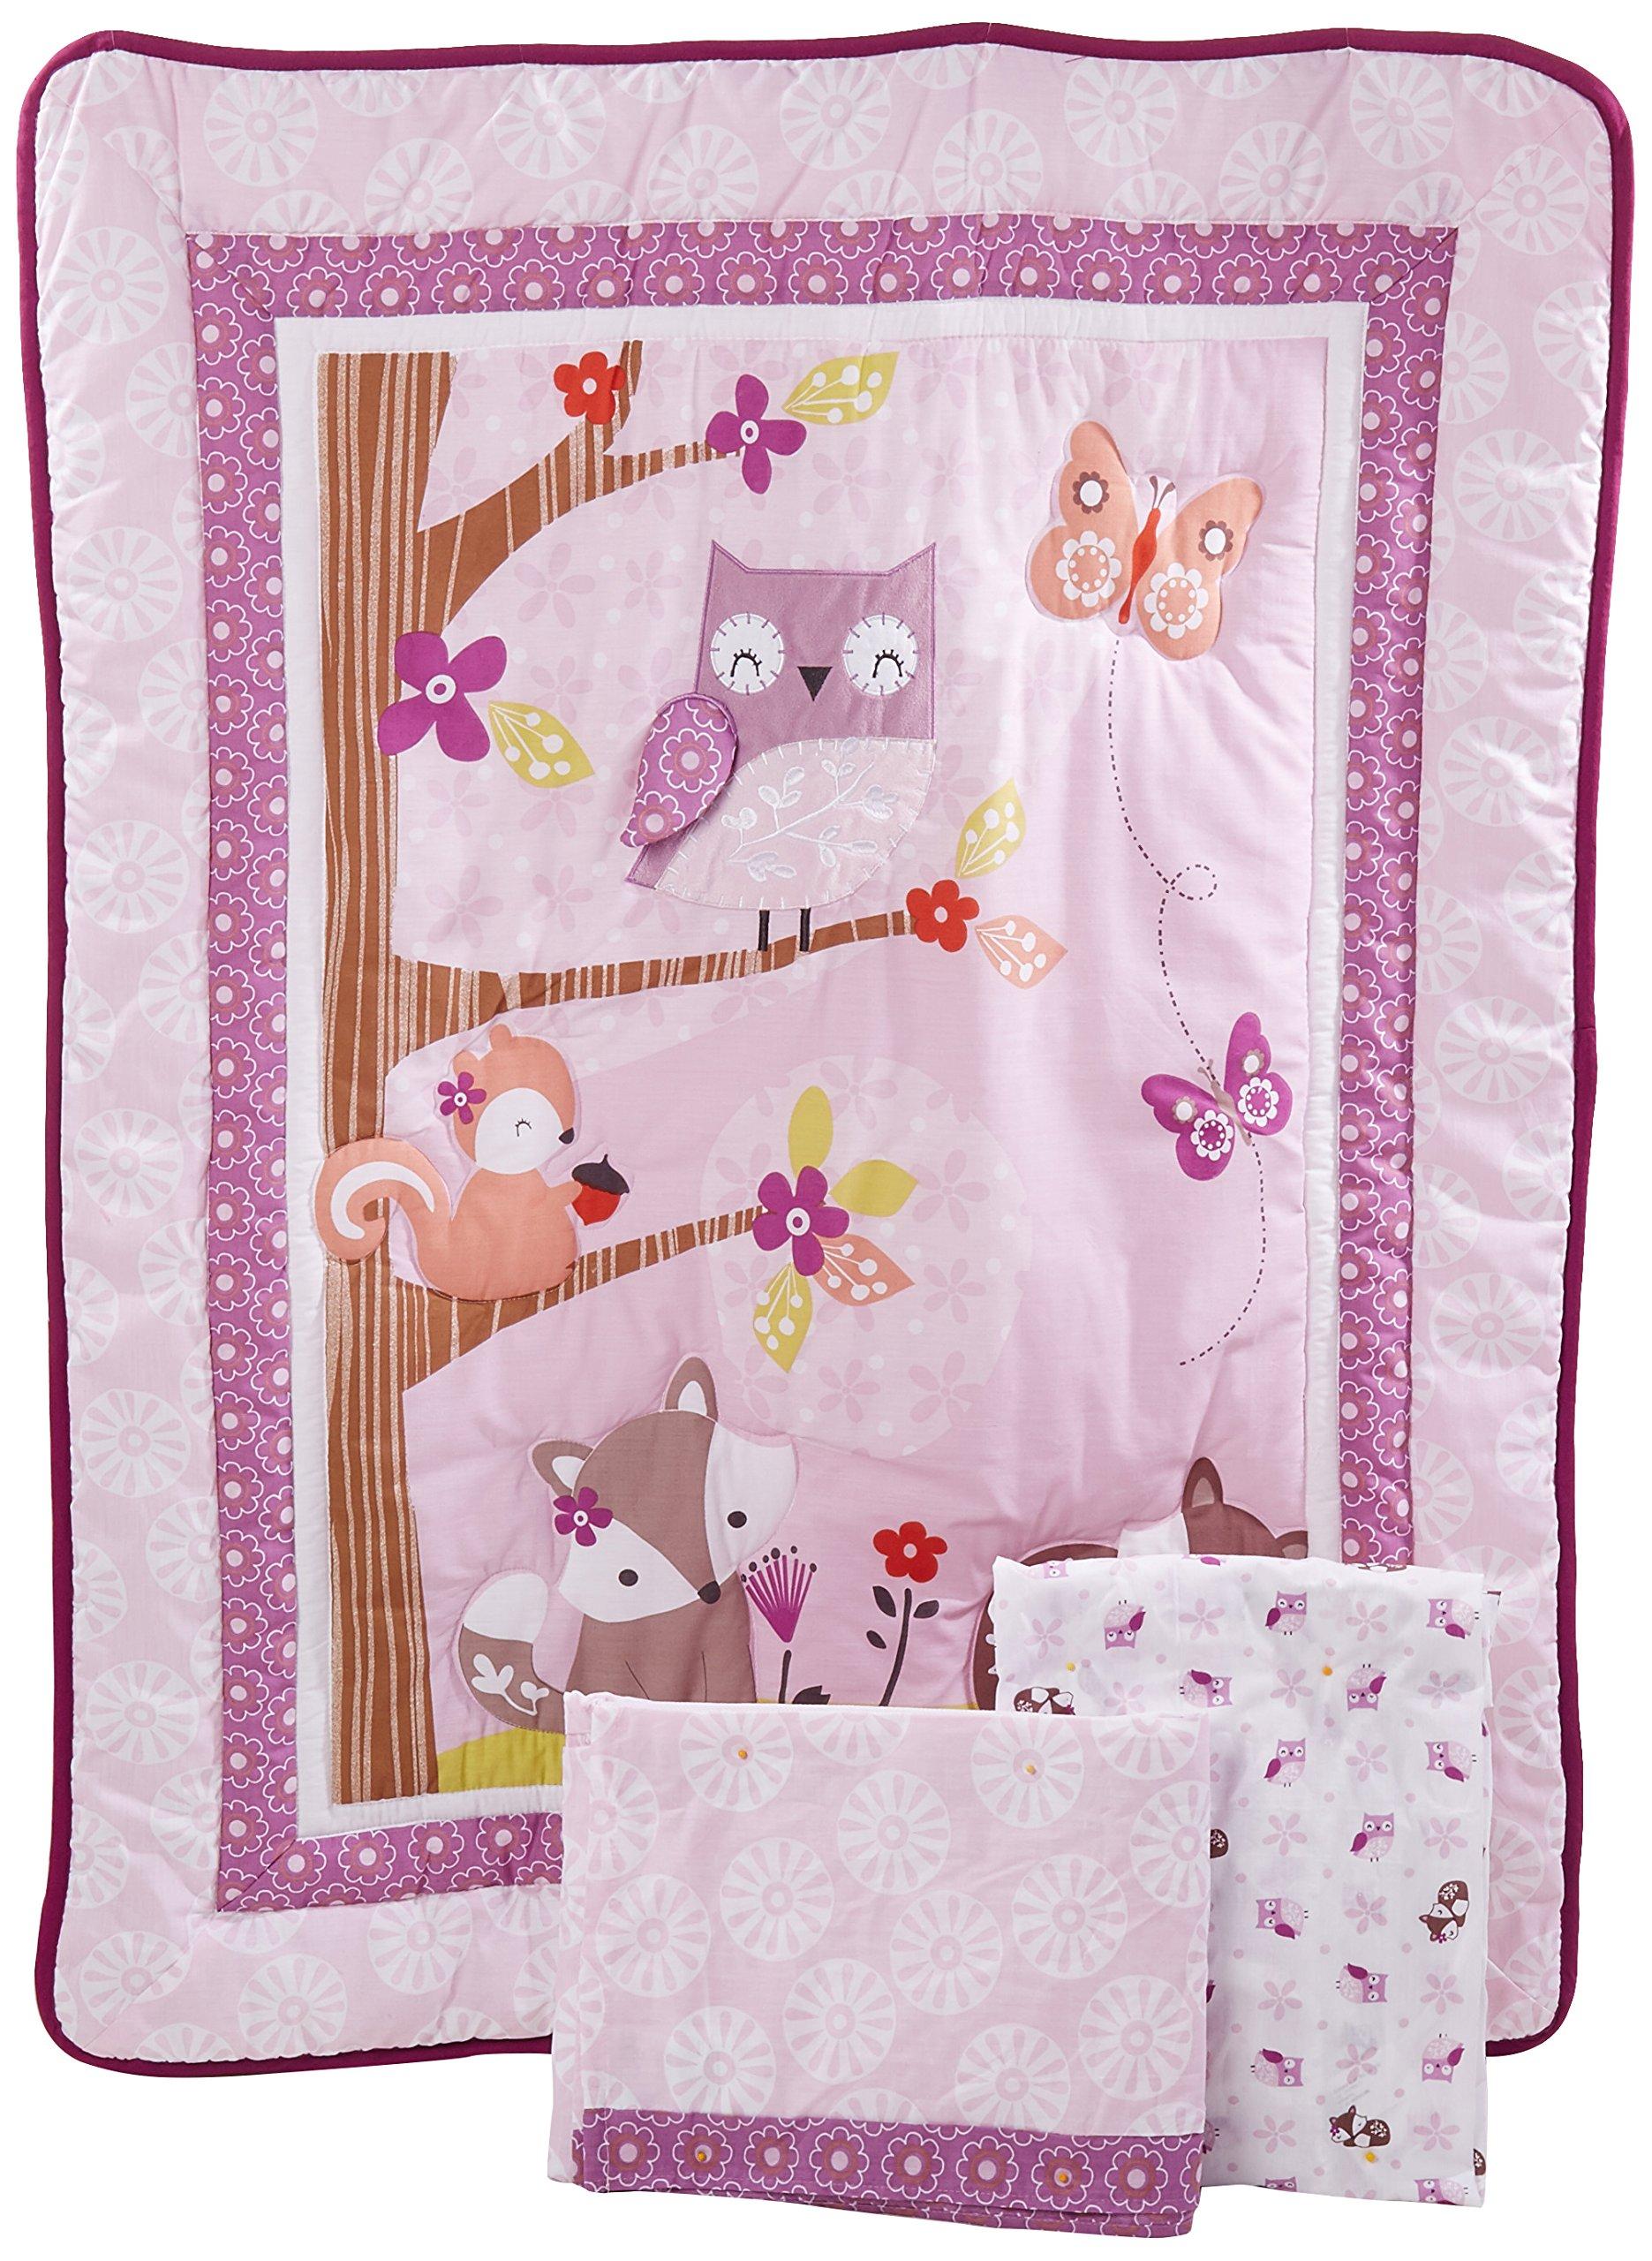 Bedtime Originals Lavender Woods 3 Piece Bedding Set by Bedtime Originals